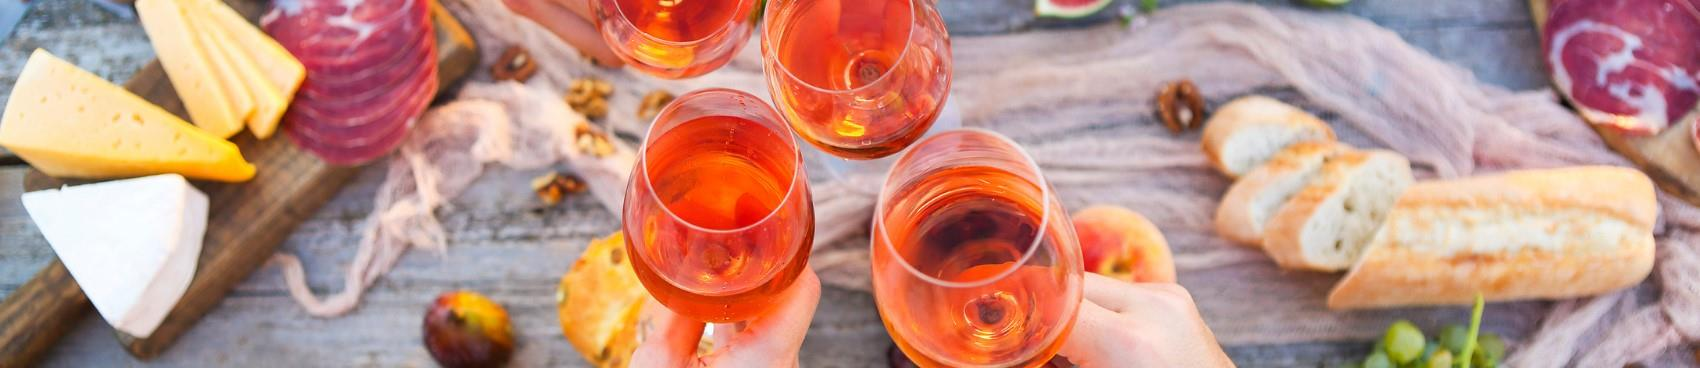 Rosé La La La - A Celebration of Colorado Rosé Wine: Trade Session